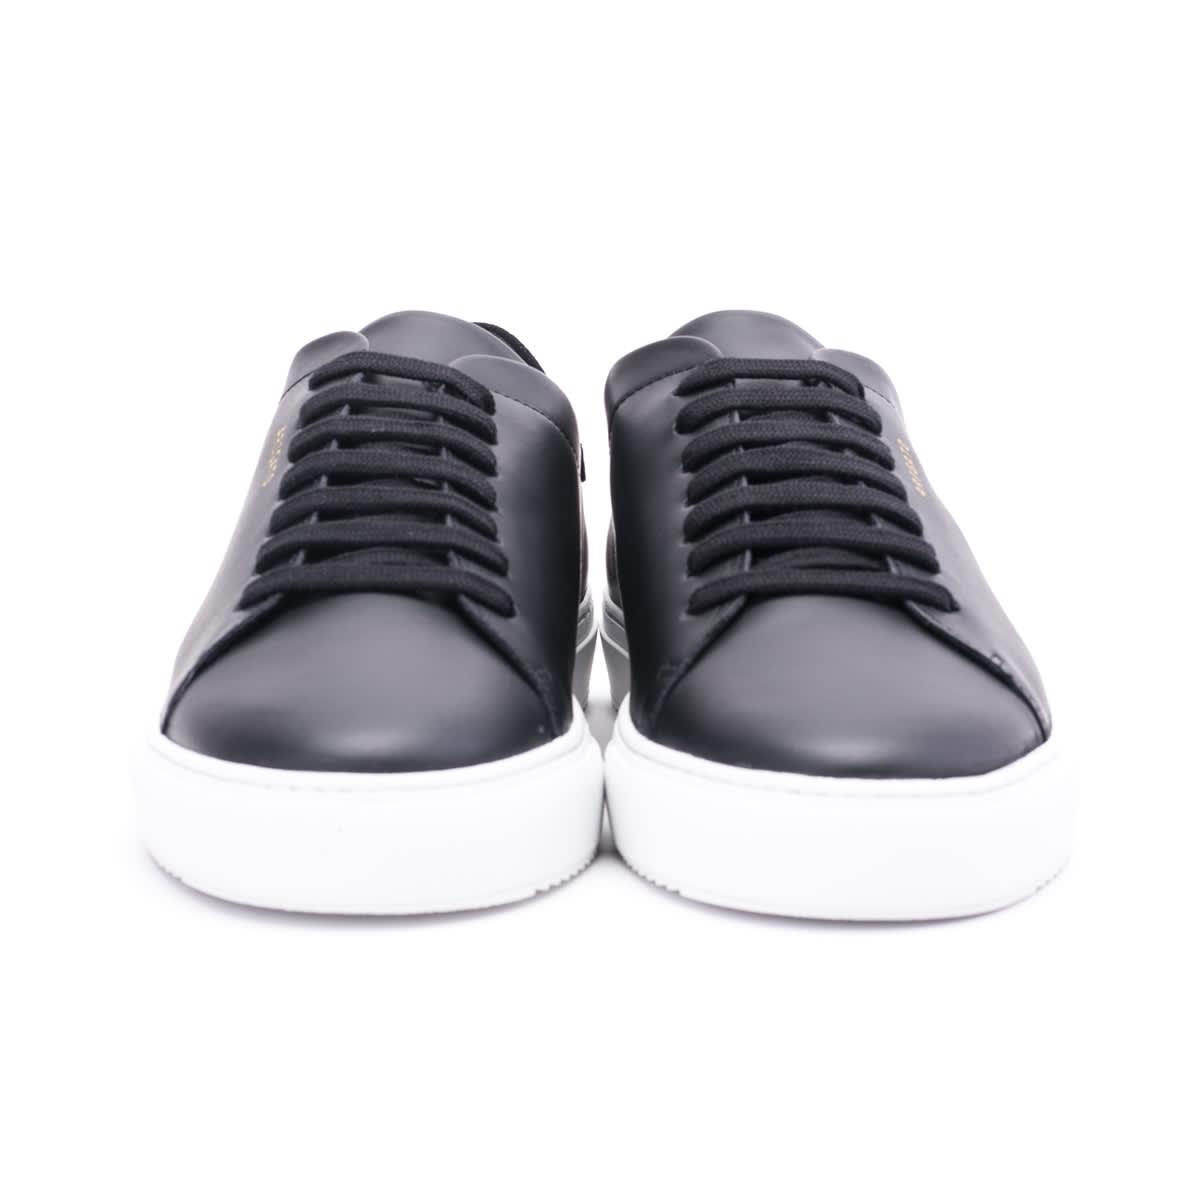 Axel Arigato Axel Arigato Leather Sneaker